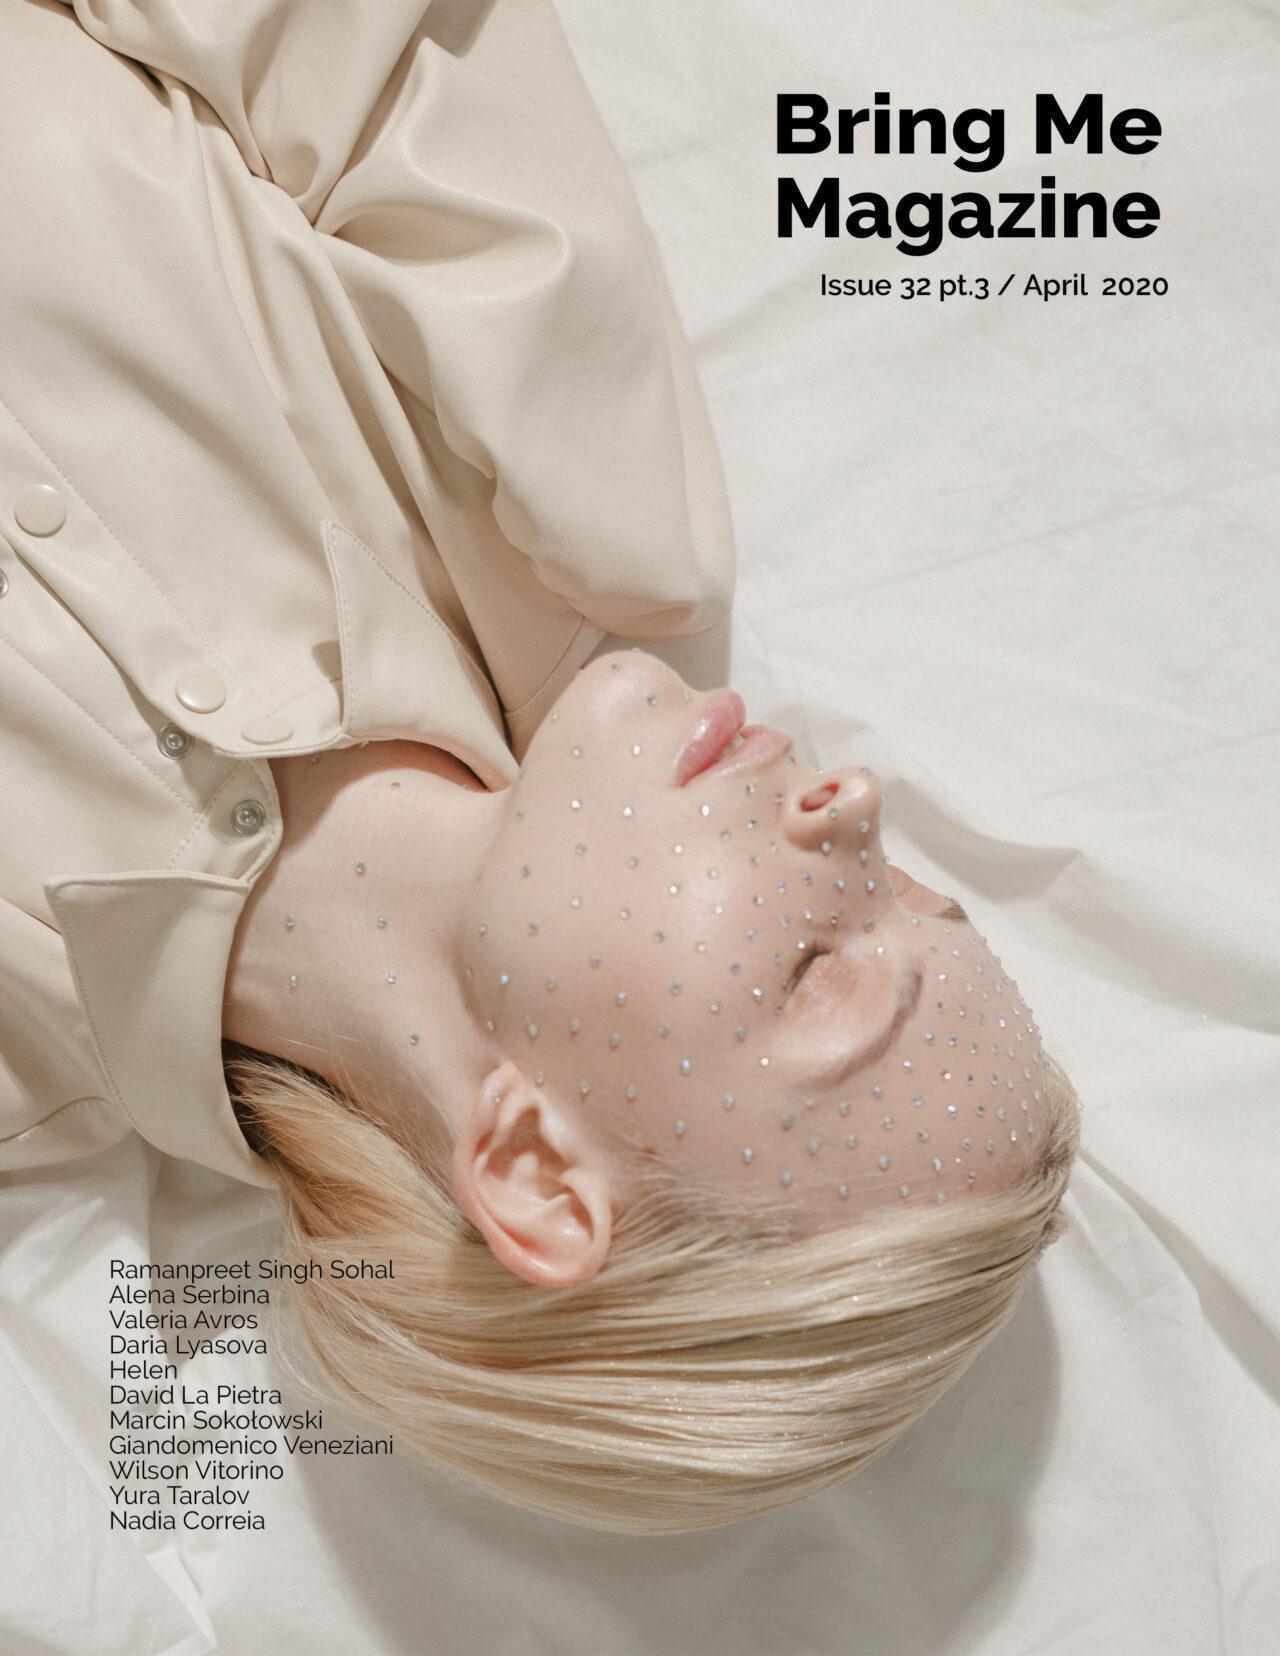 Bring to me Magazine